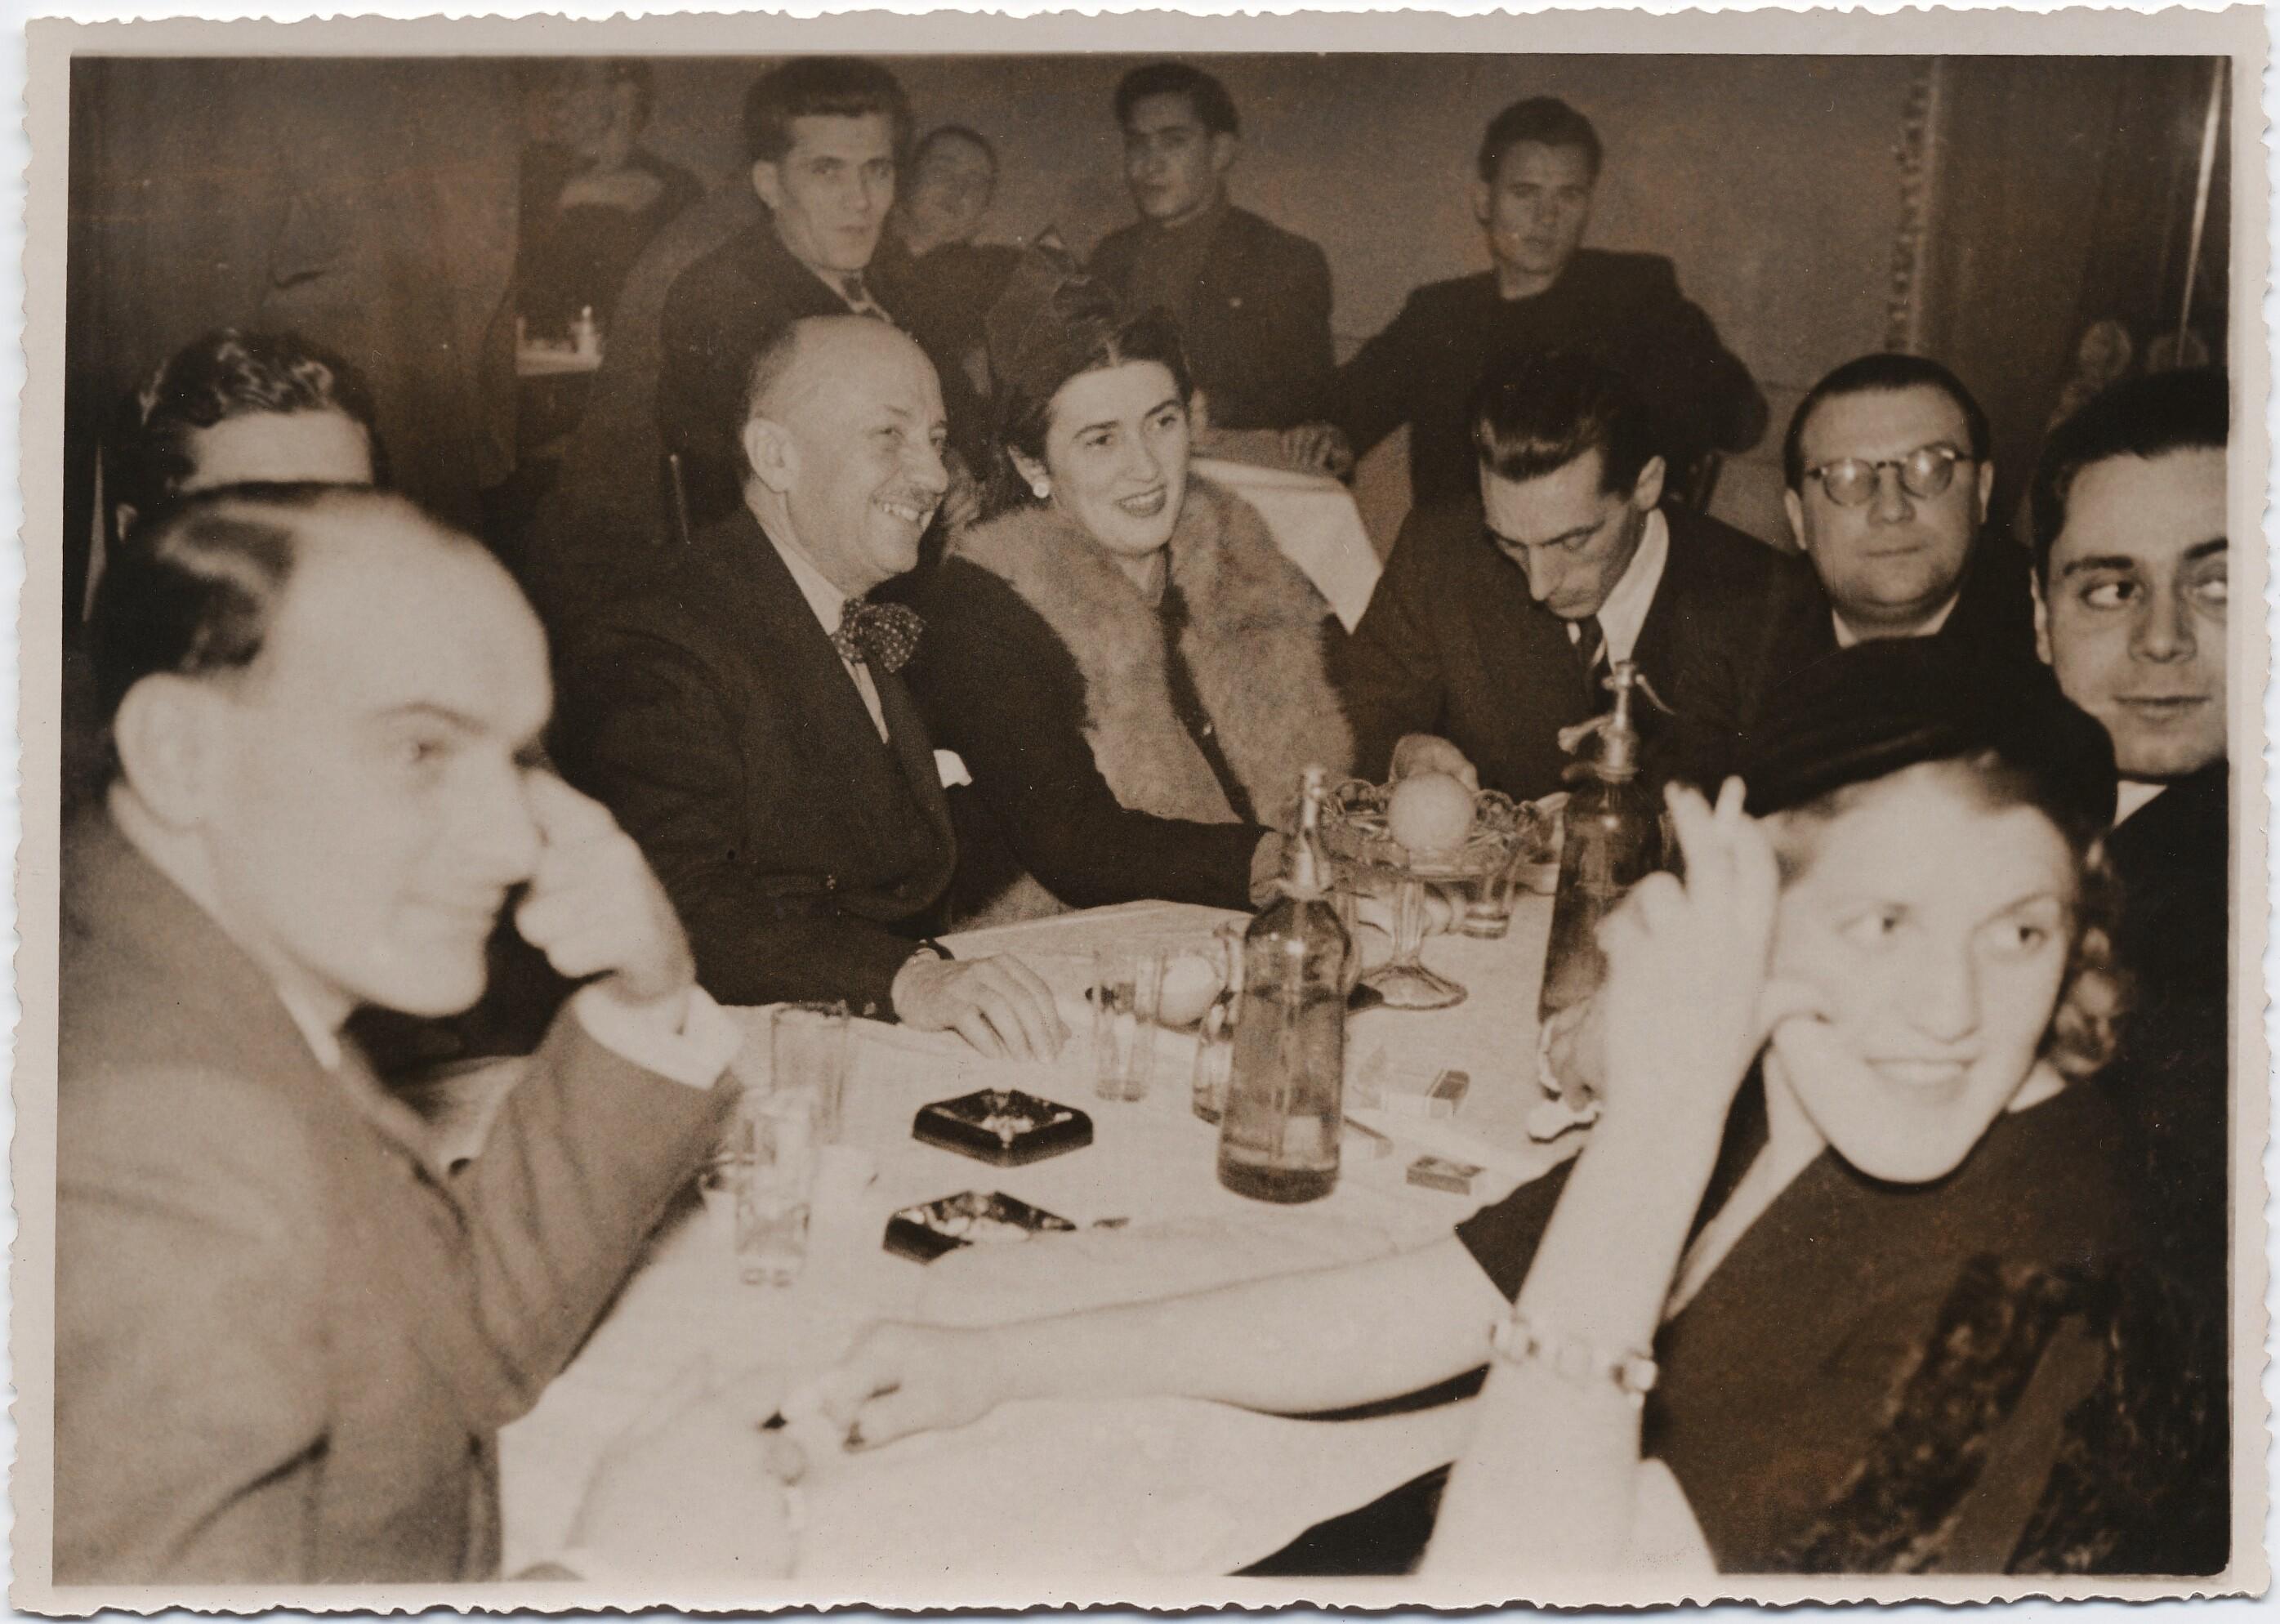 Белград. Филиппо Томмазо Маринетти и Бенедетта Каппа Маринетти с другими в Таверне Дарданелле